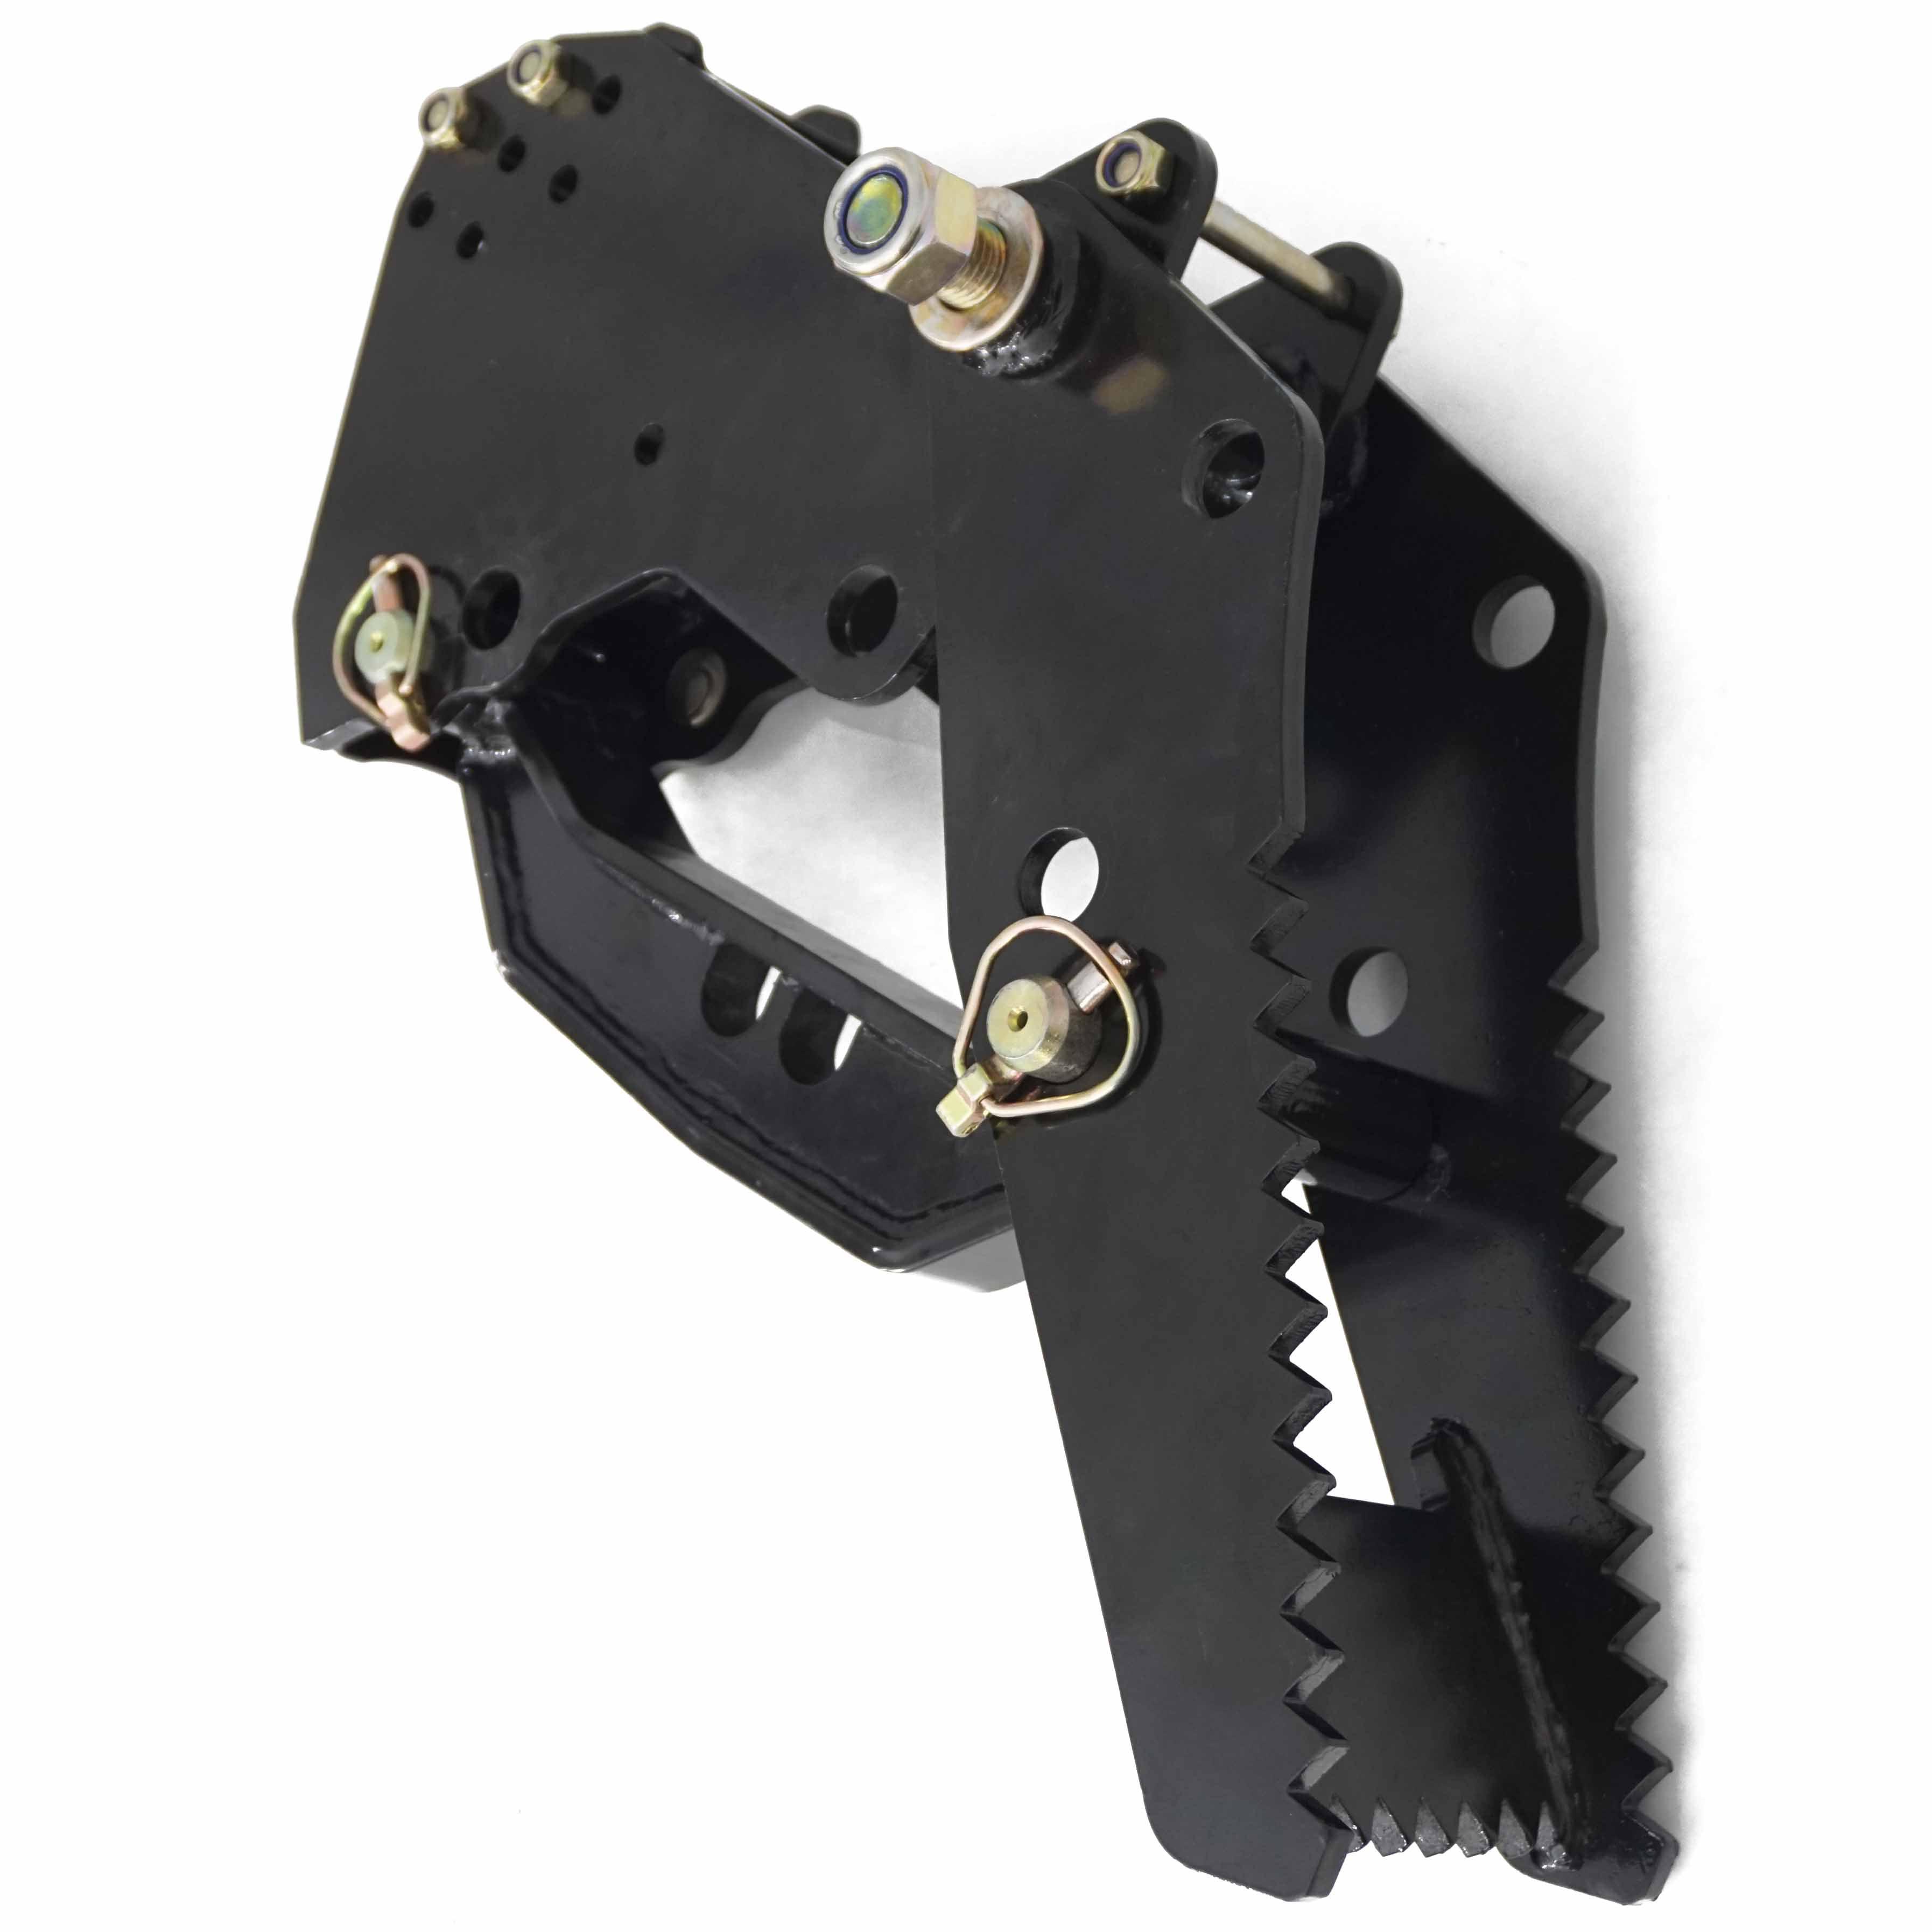 Backhoe Thumb Excavator Bolt On Universal Claw Tractor Attachment Kubota Deere